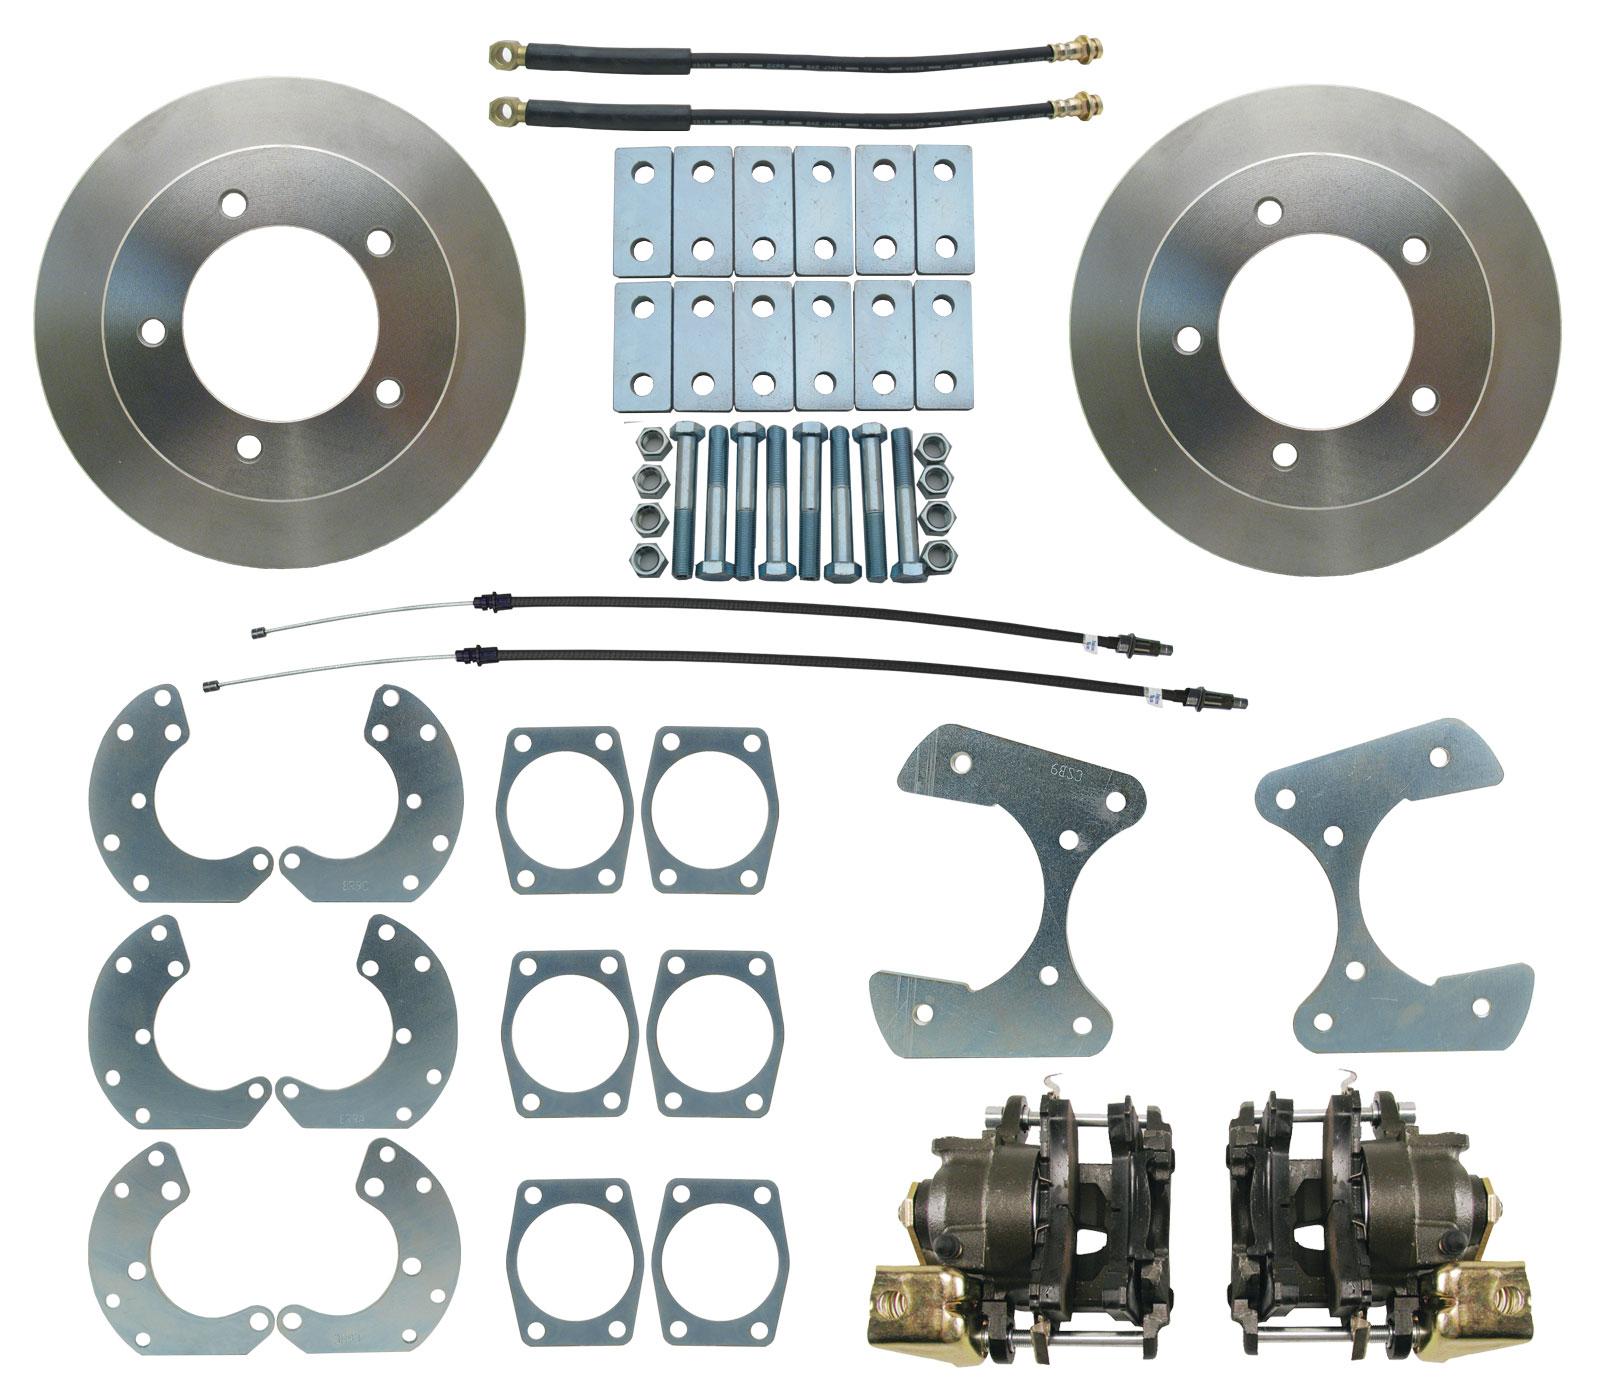 9 Ford Truck Rear End Disc Brake Kit